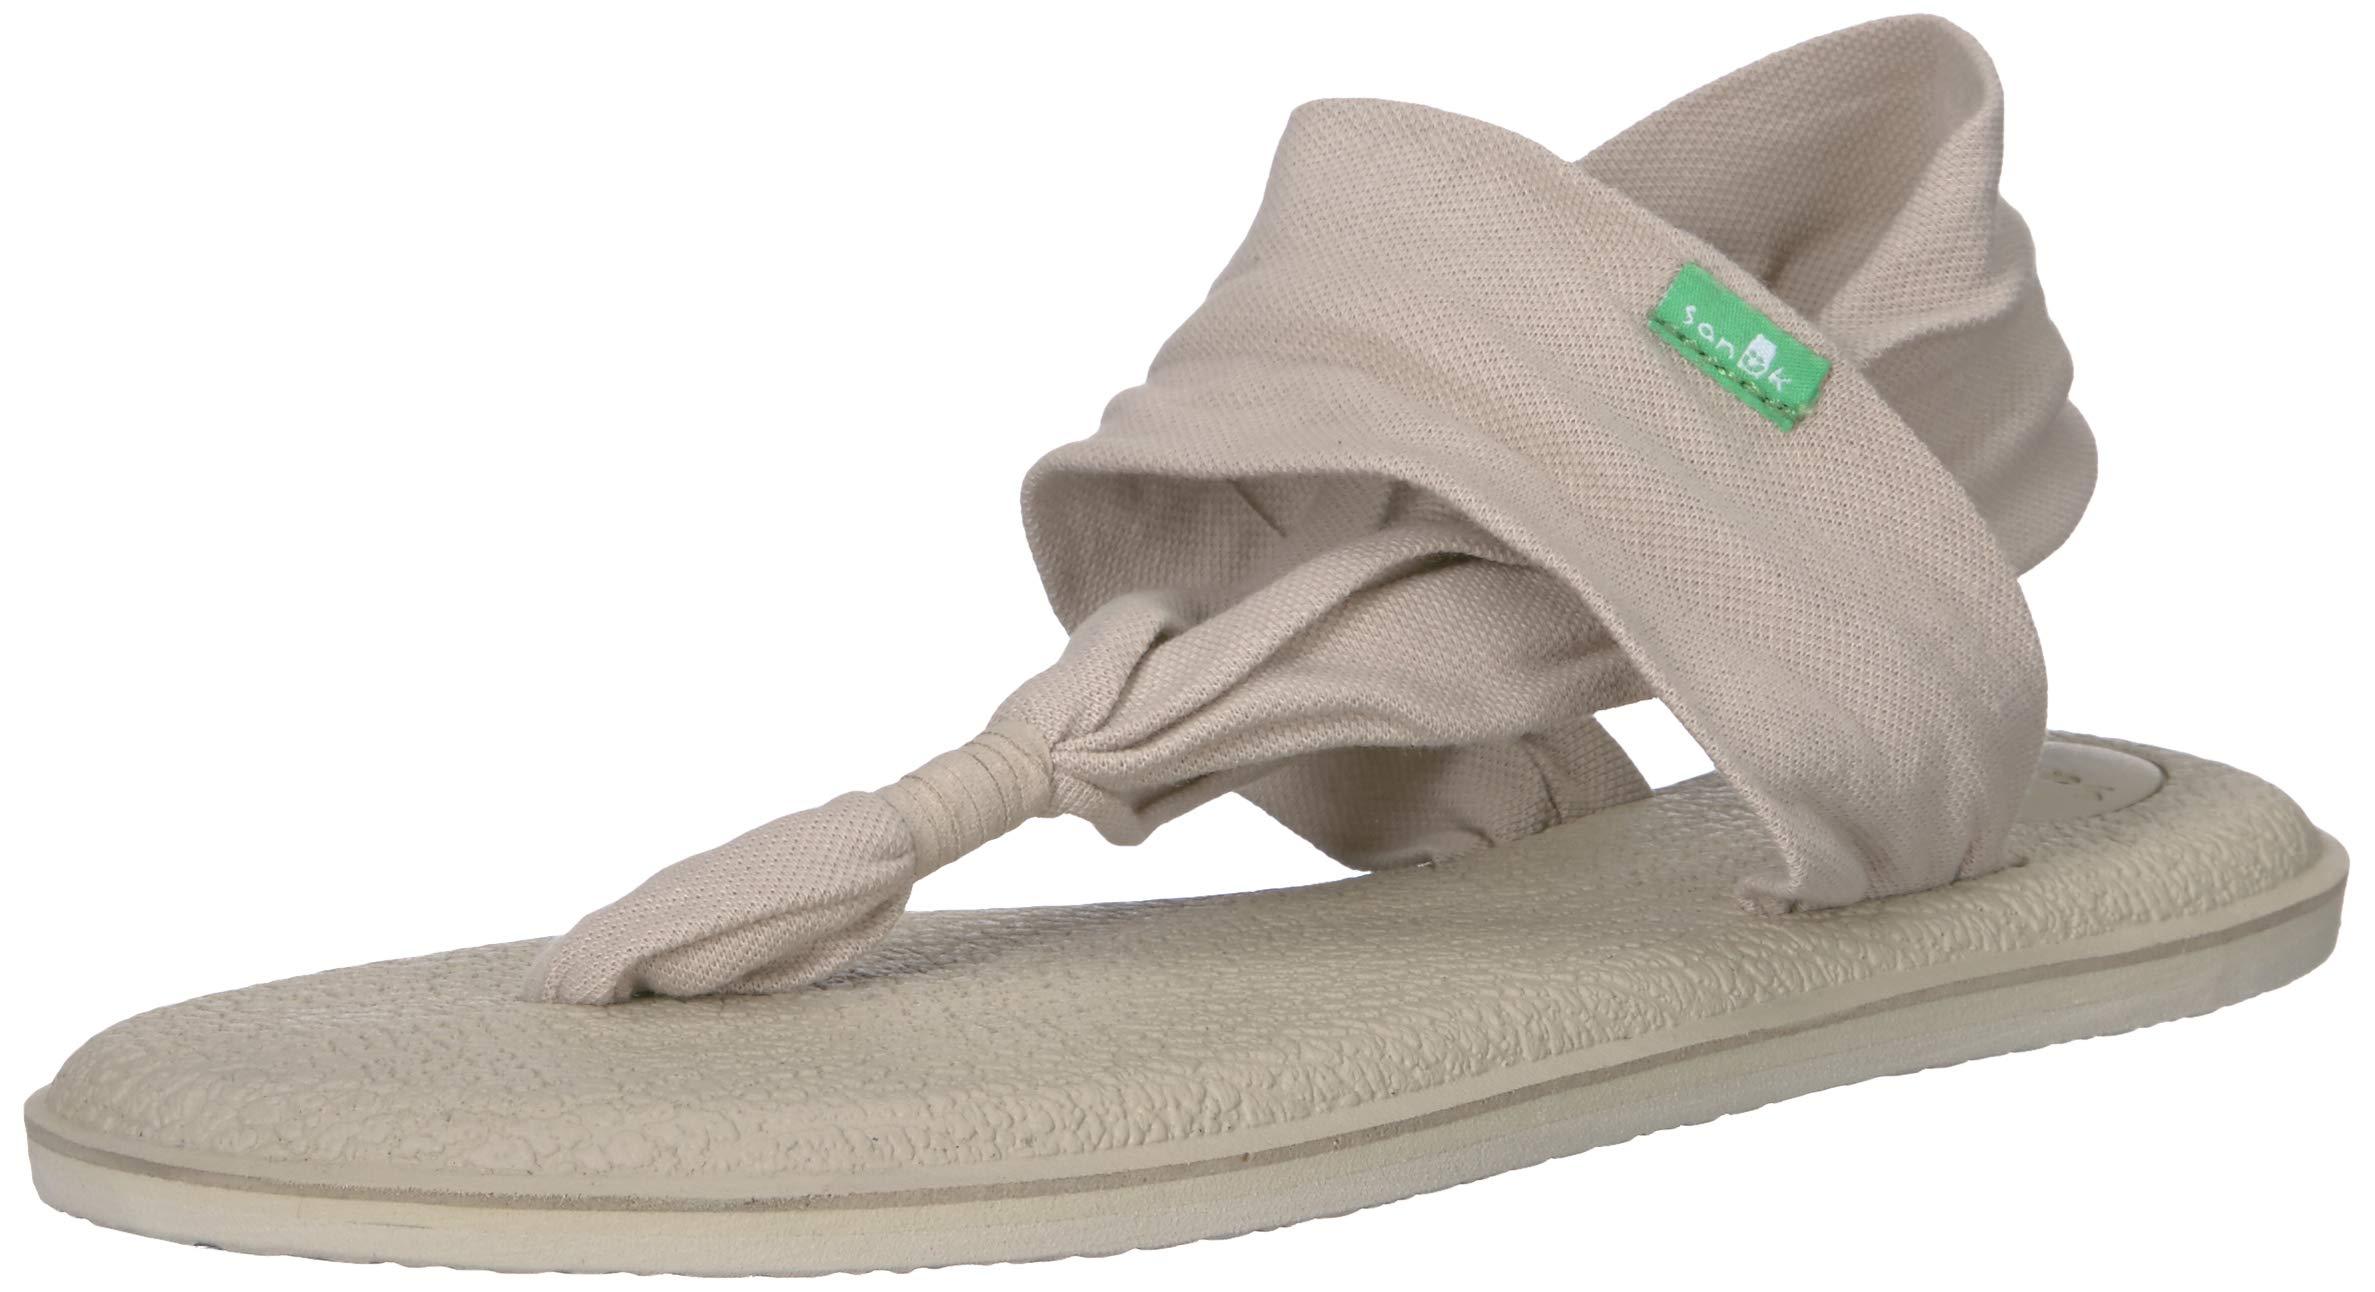 Sanuk Women's Yoga Sling 2 LX Flat Sandal, Peyote/Metallic Champagne, 06 M US